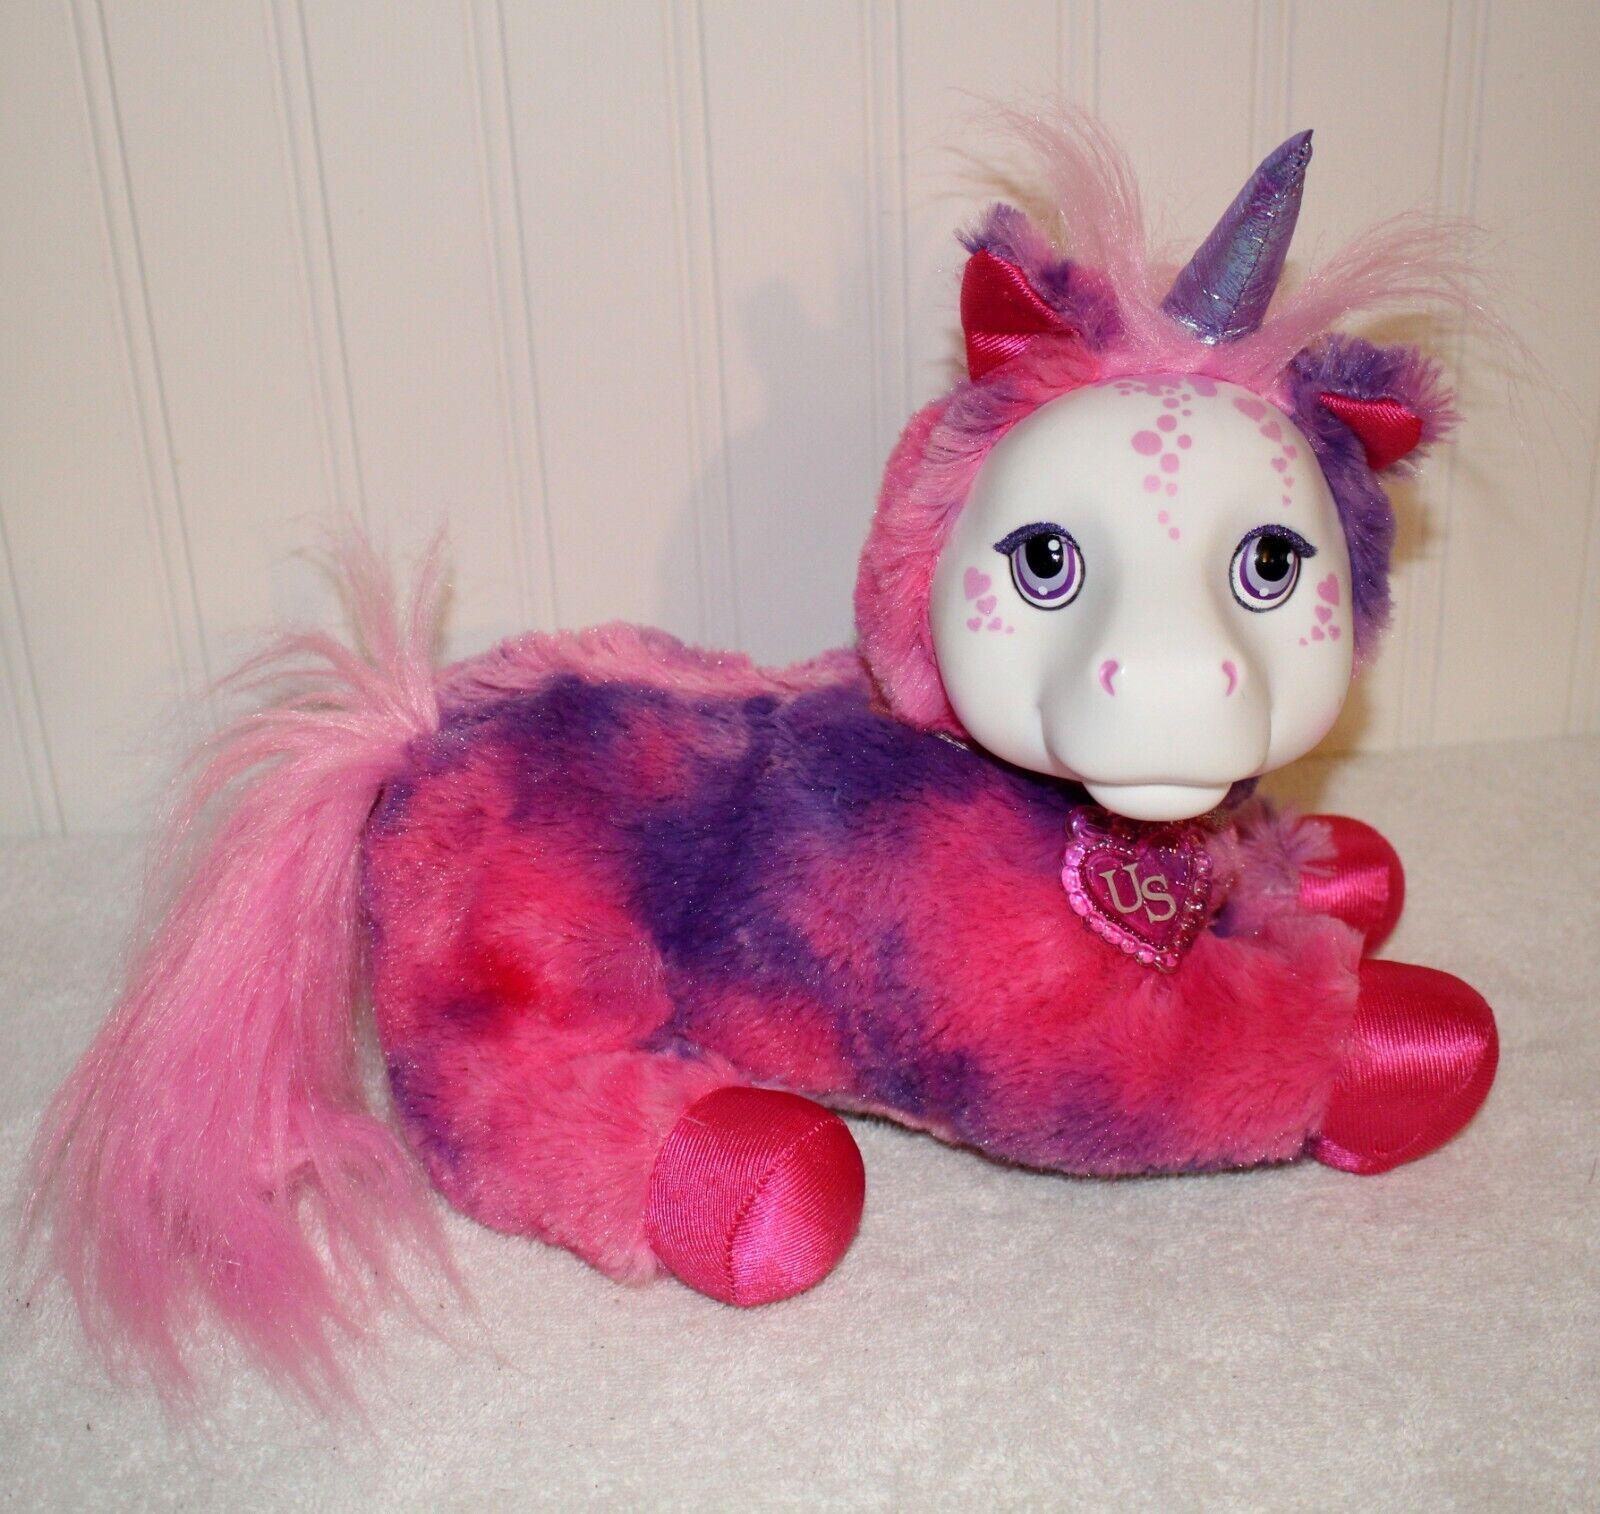 Unicorn Surprise  Livia Plush Doll Stuffed Animal purple pink  2017 Just Play